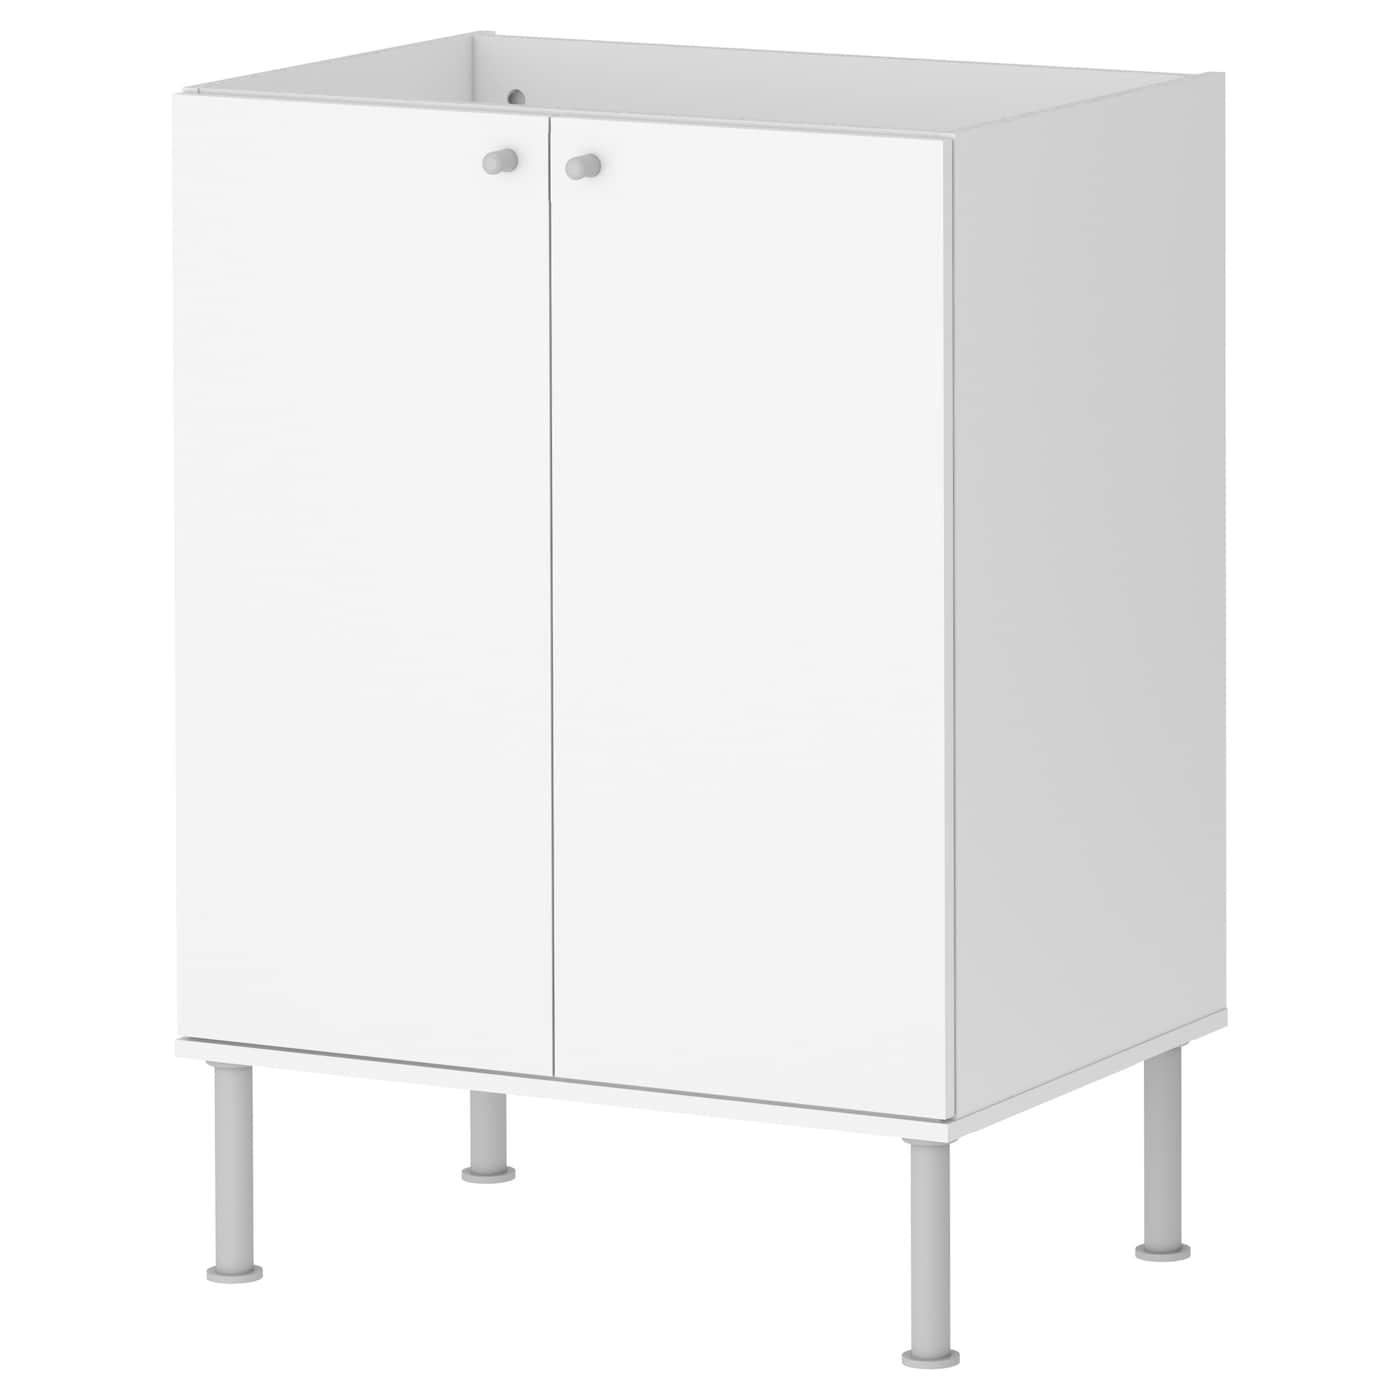 FULLENÉlément lavabo Blanc 60 x 79 cm IKEA